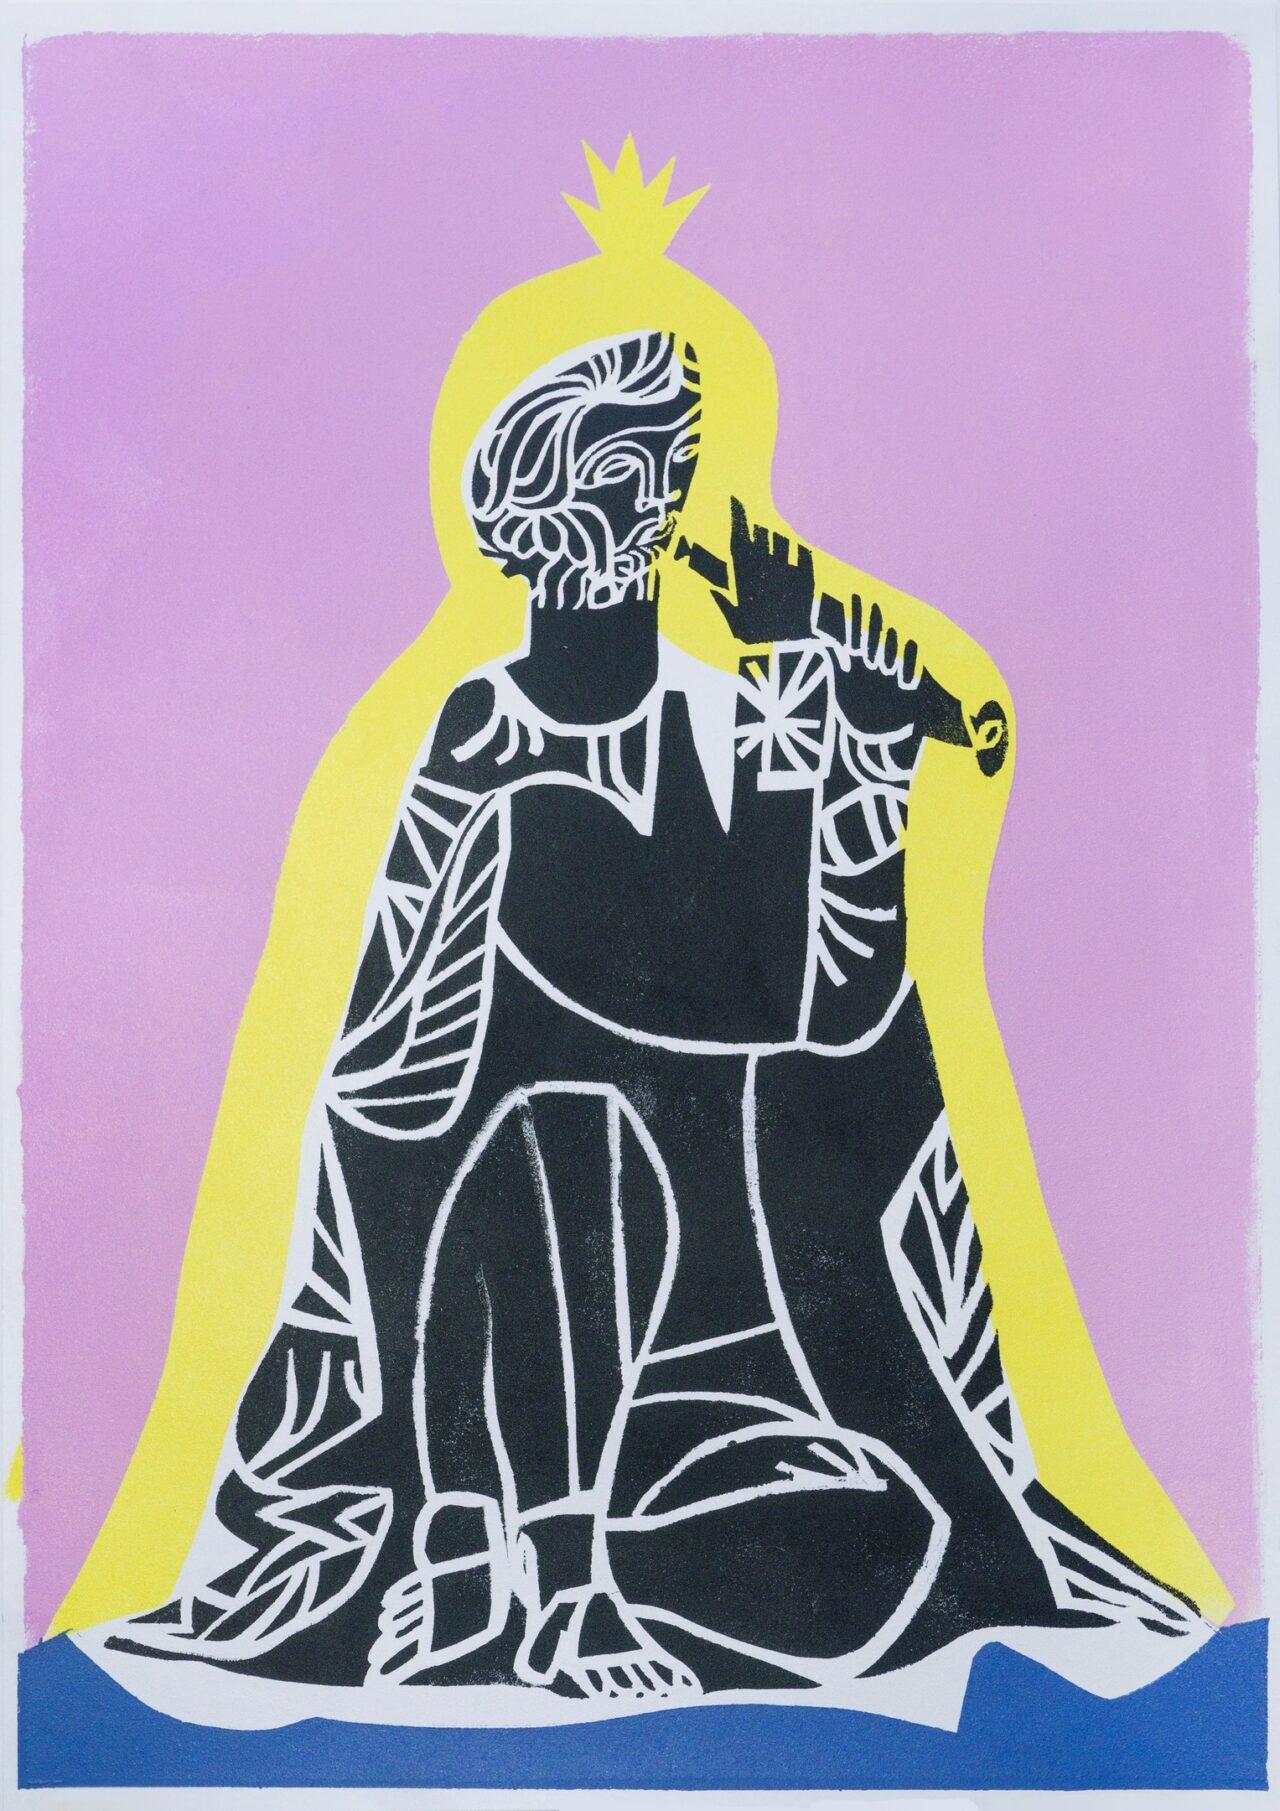 Александр Бирук. Флейтист в плаще. 2020. Бумага, акрил, техника ручной трафаретной печати. 30 х 42 см.